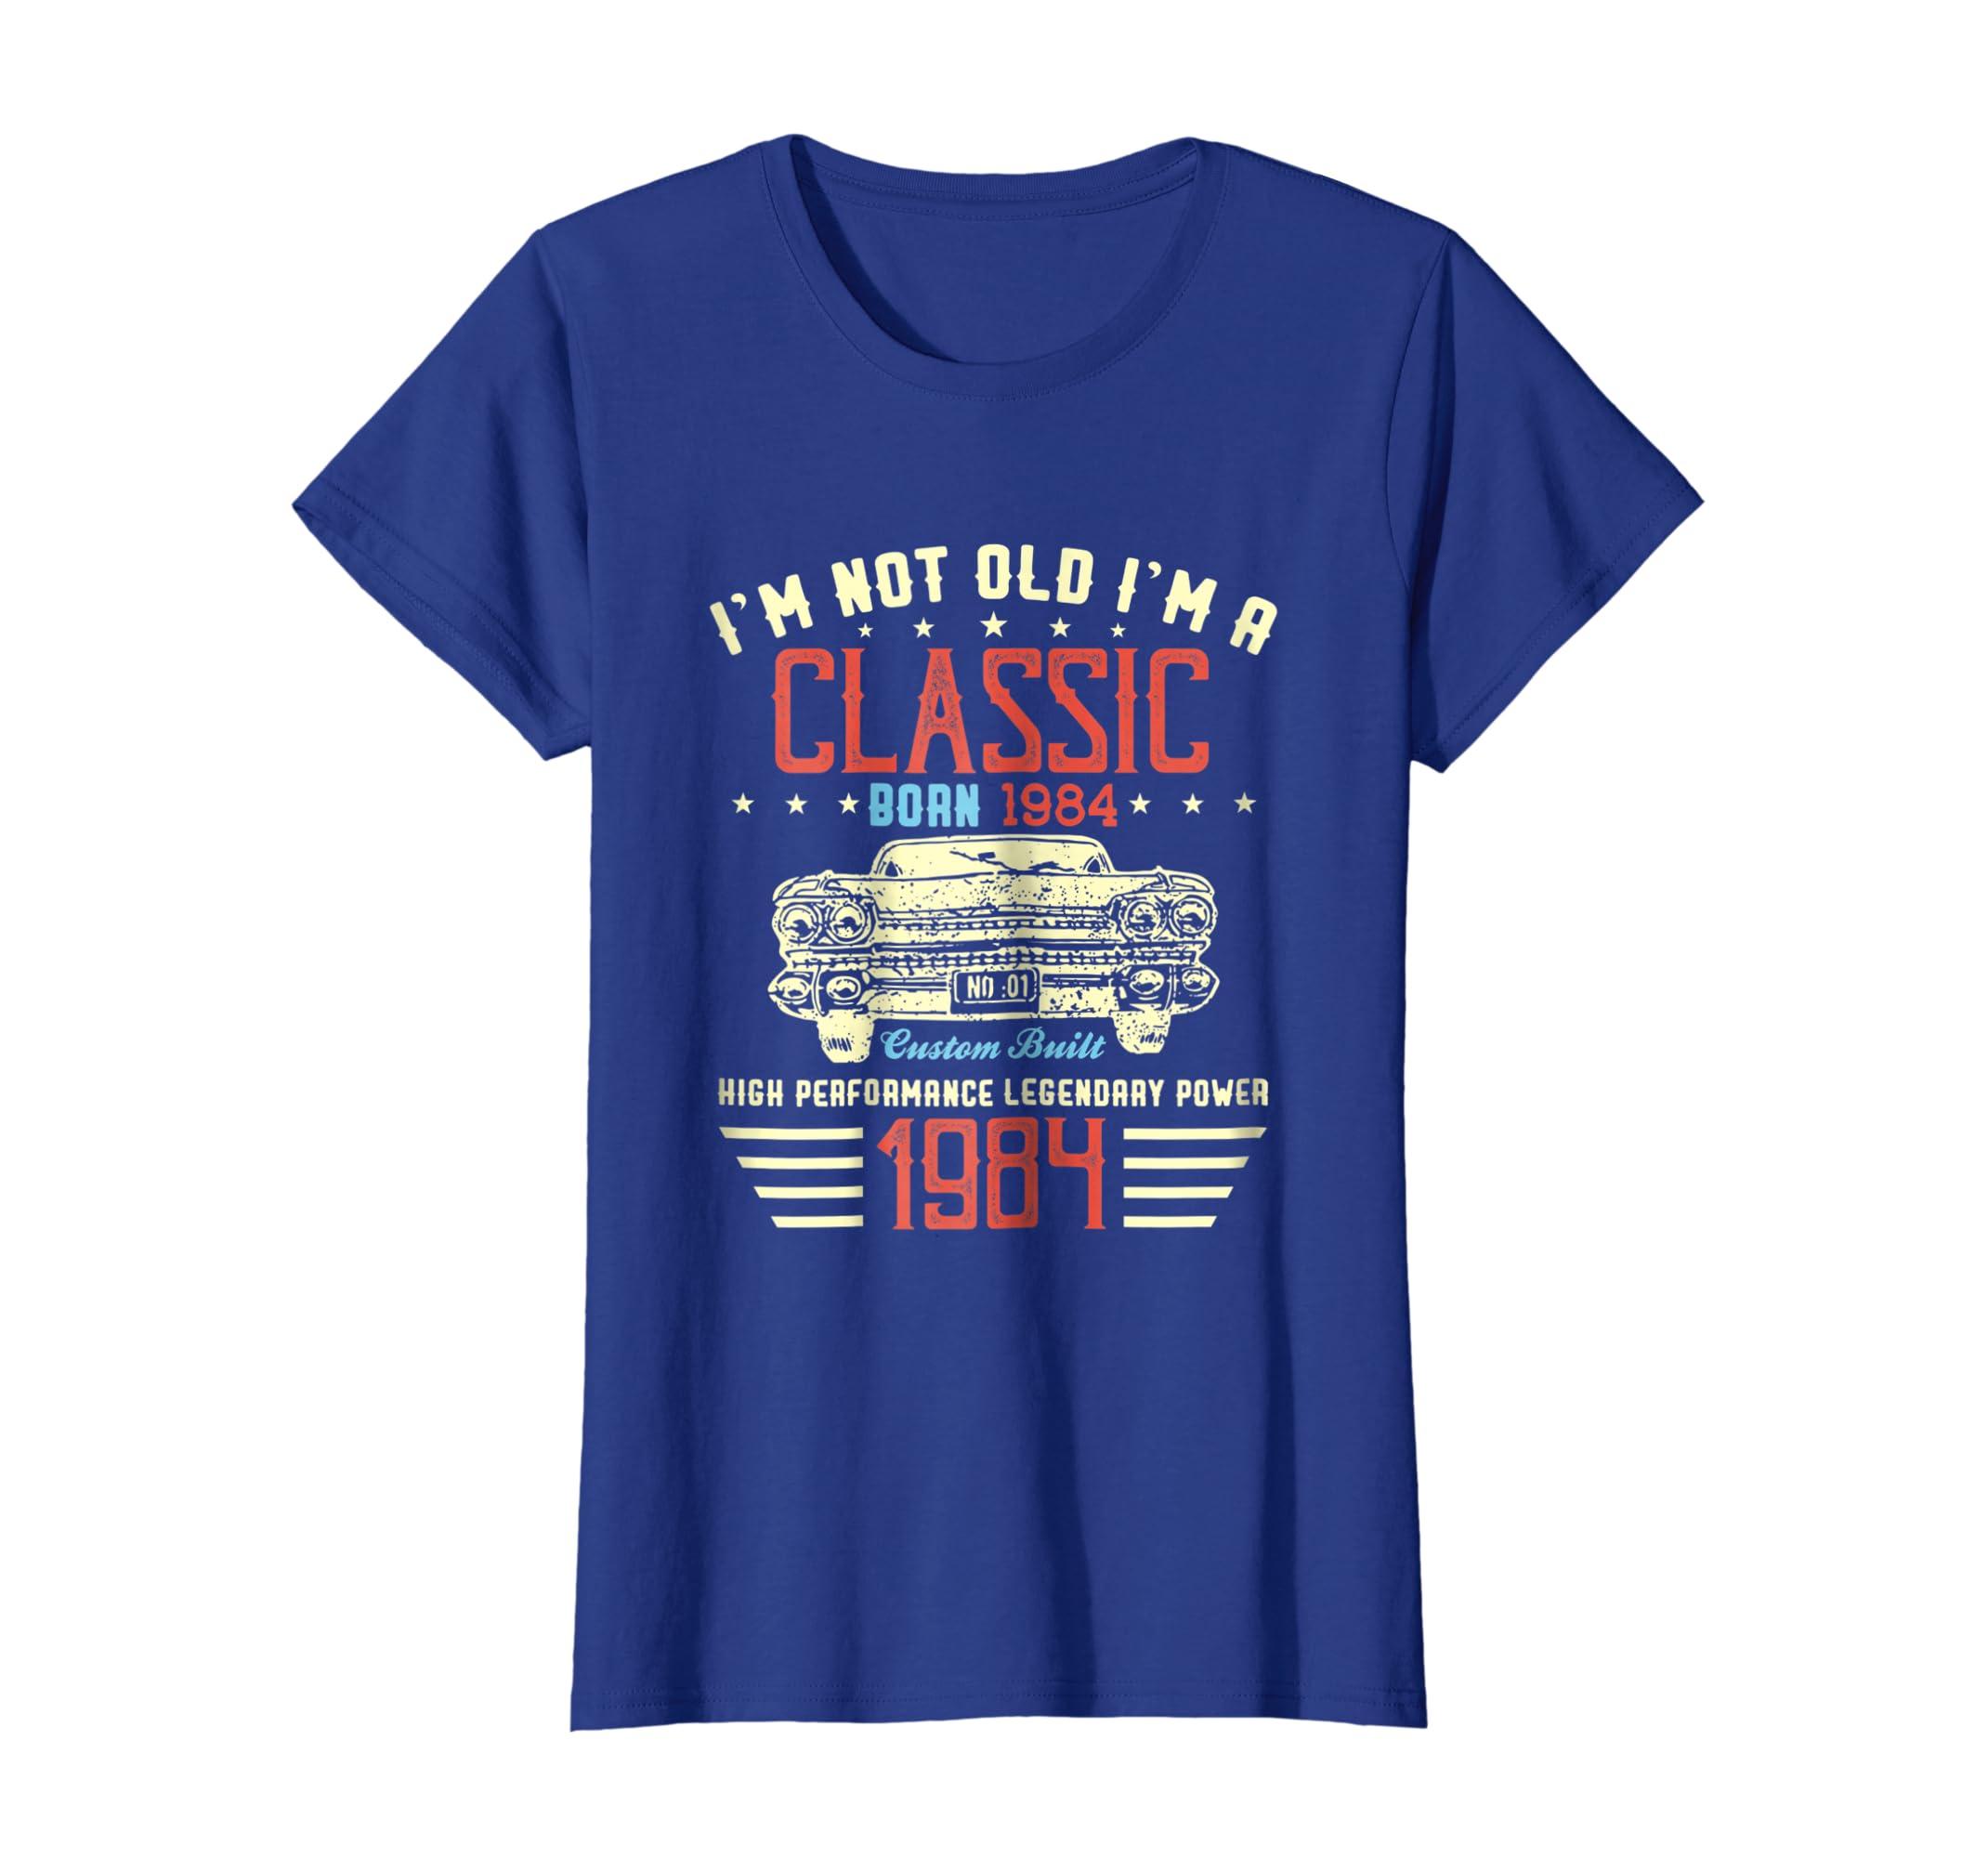 b21fecedc Amazon.com: I'm Not Old Im a Classic 1984 35th Funny Birthday T-Shirt:  Clothing